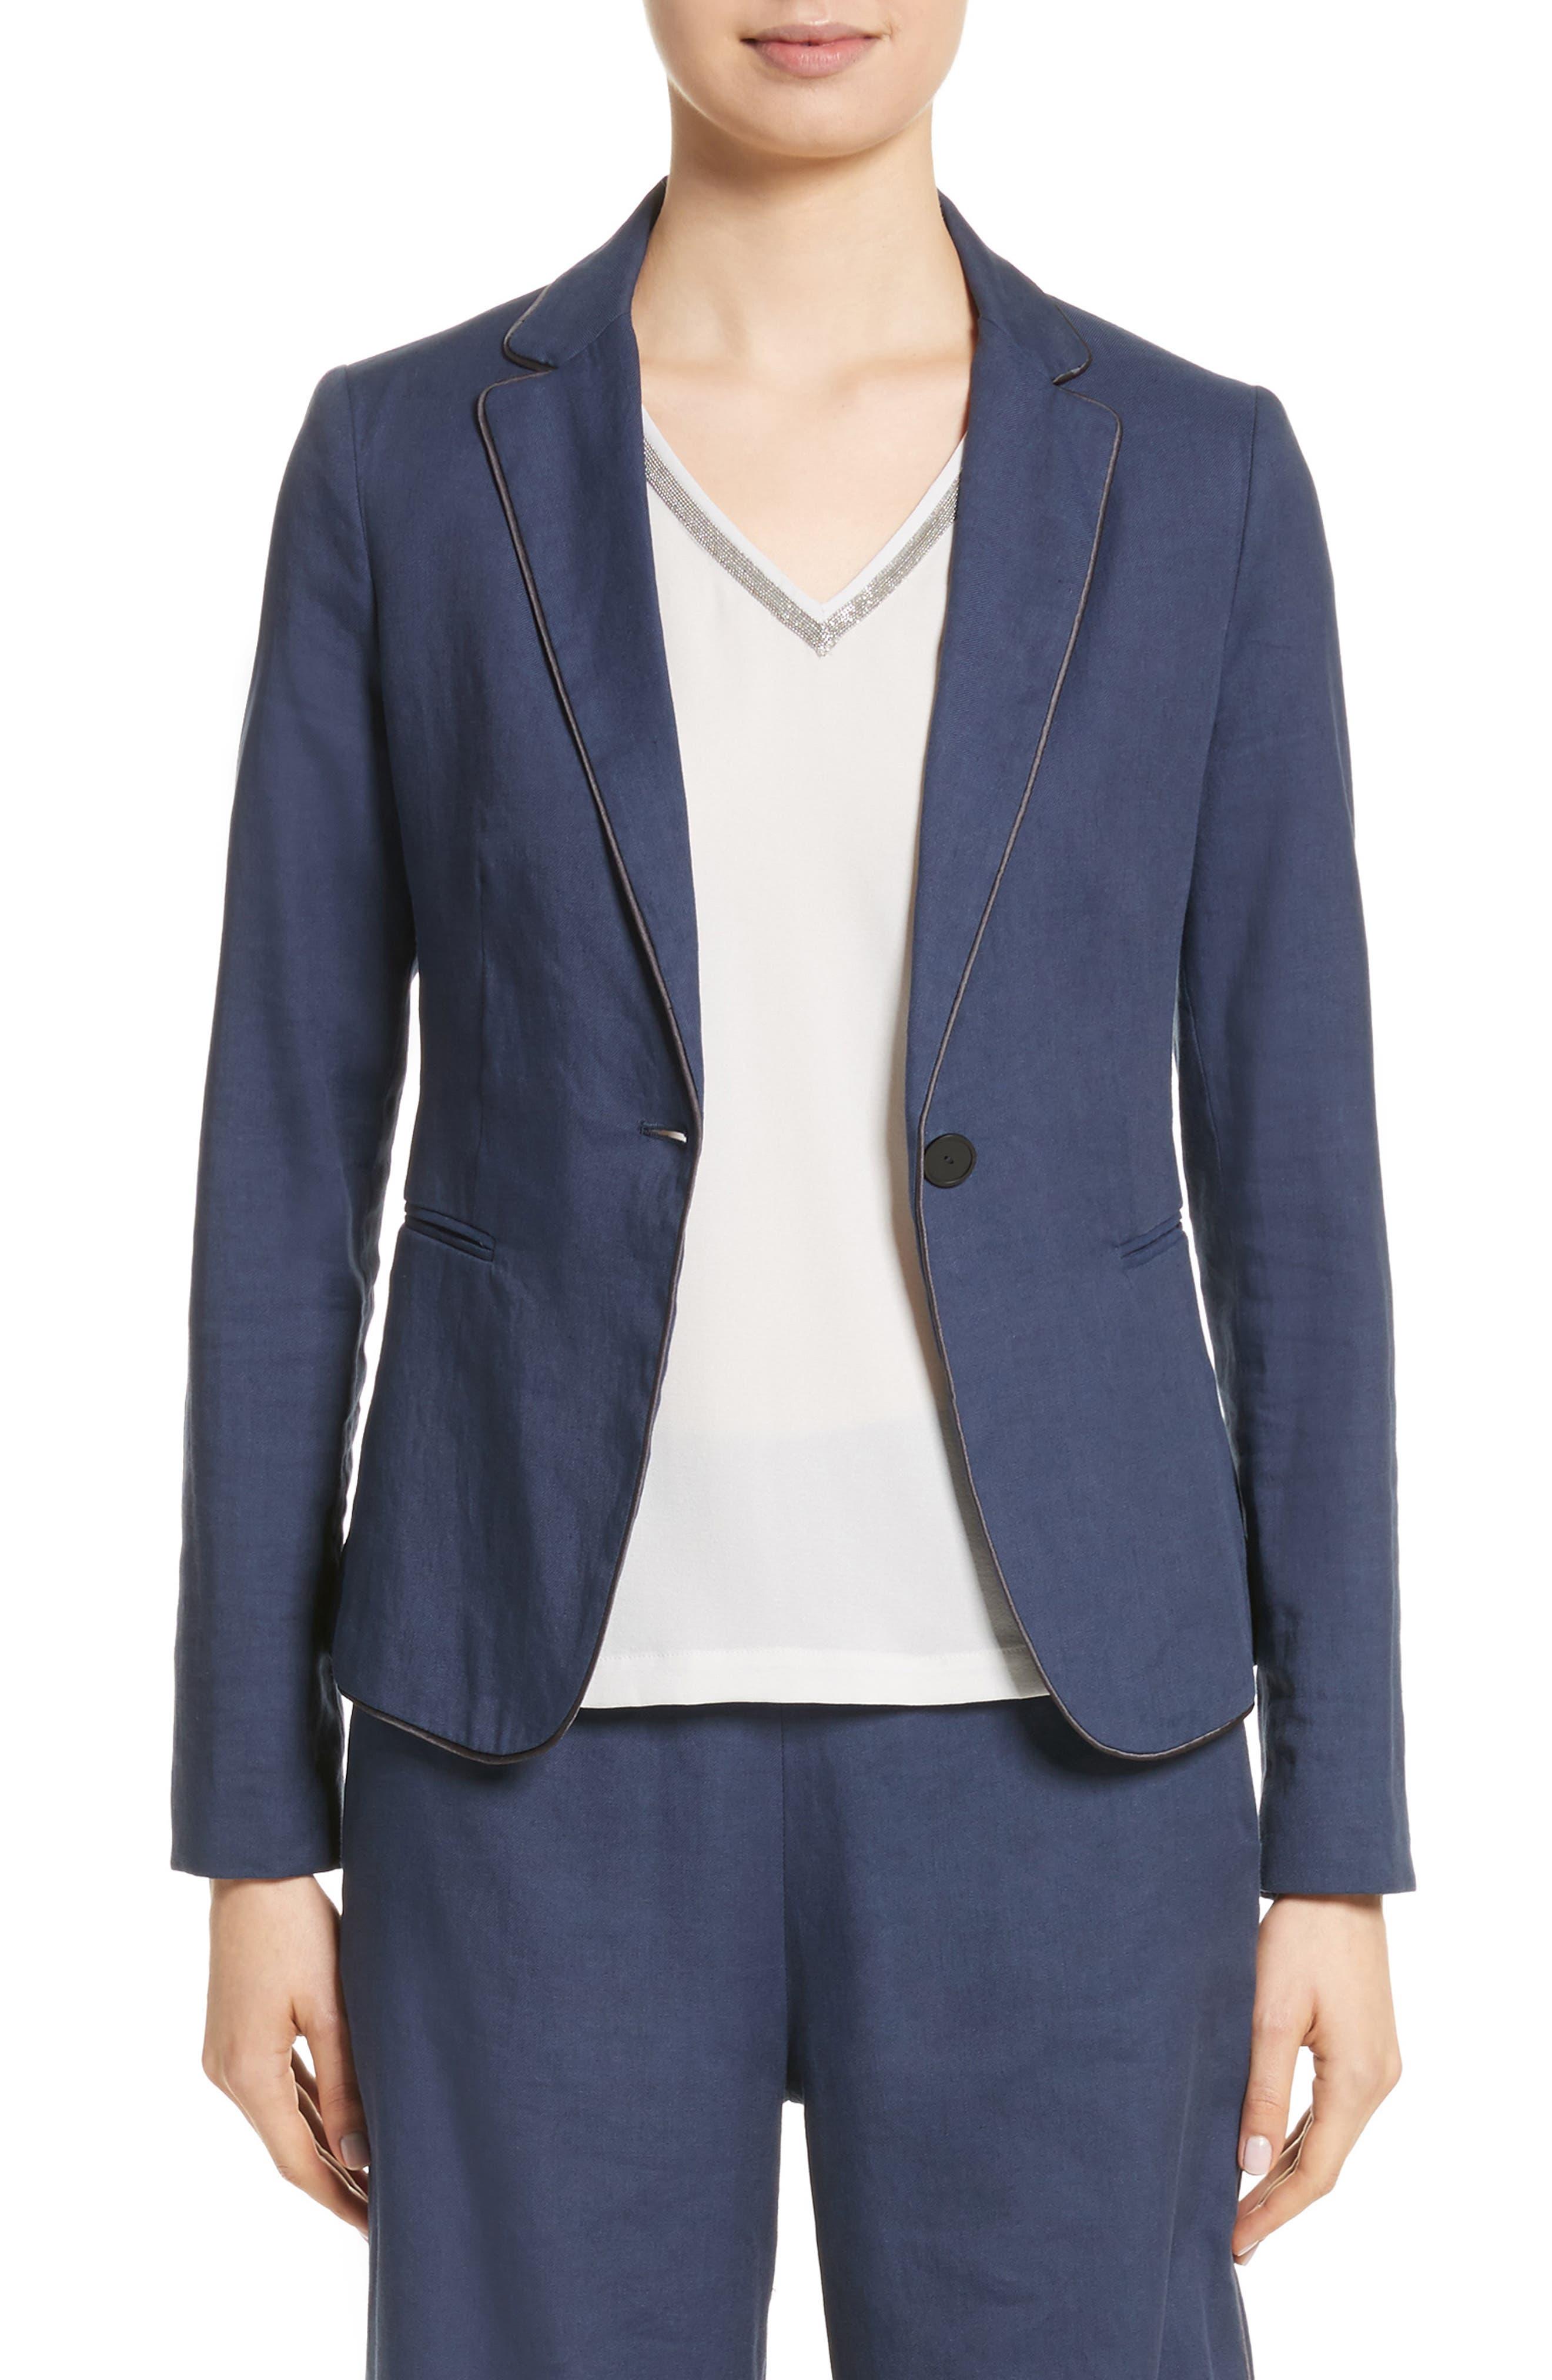 Main Image - Fabiana Filippi Piped Linen & Cotton Blend Blazer